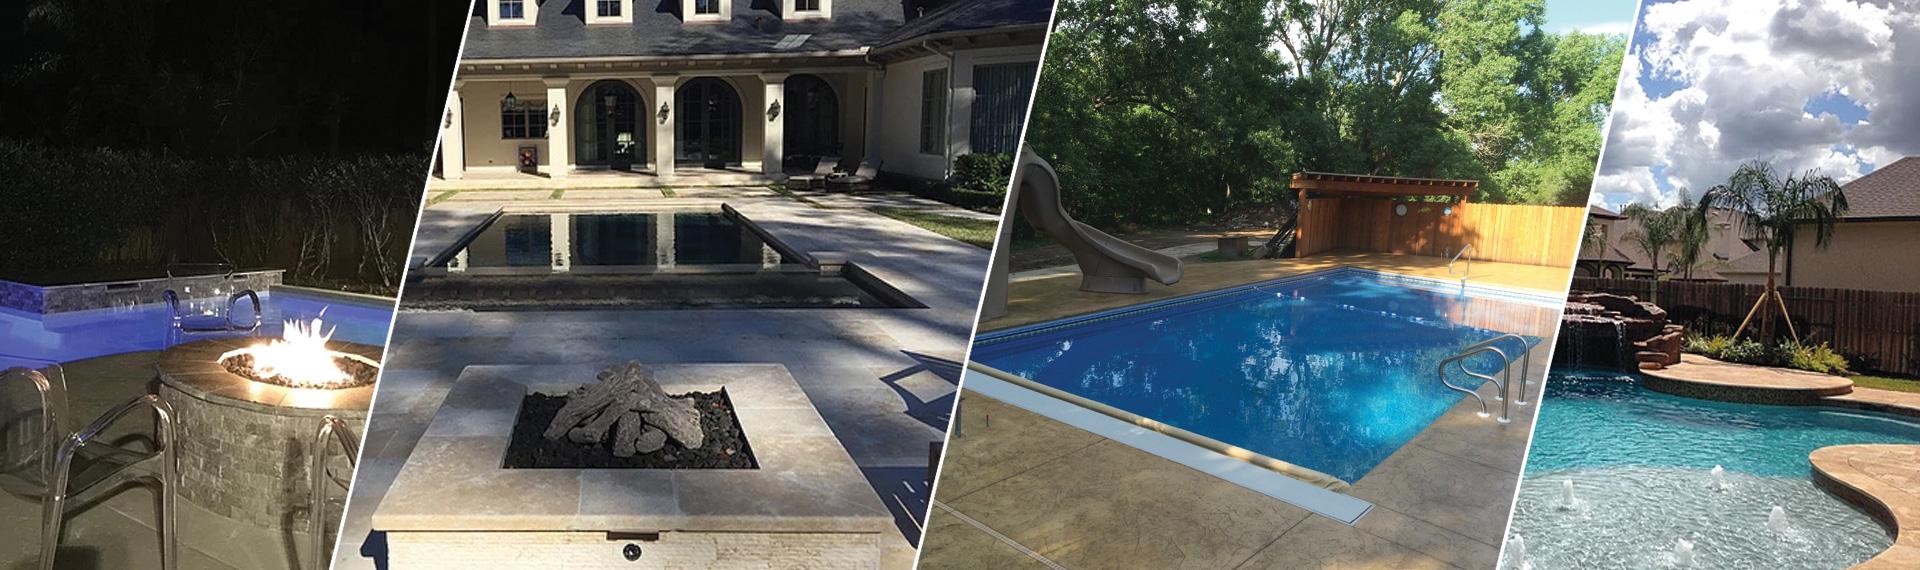 Build My Pool At Cost Missouri City TX